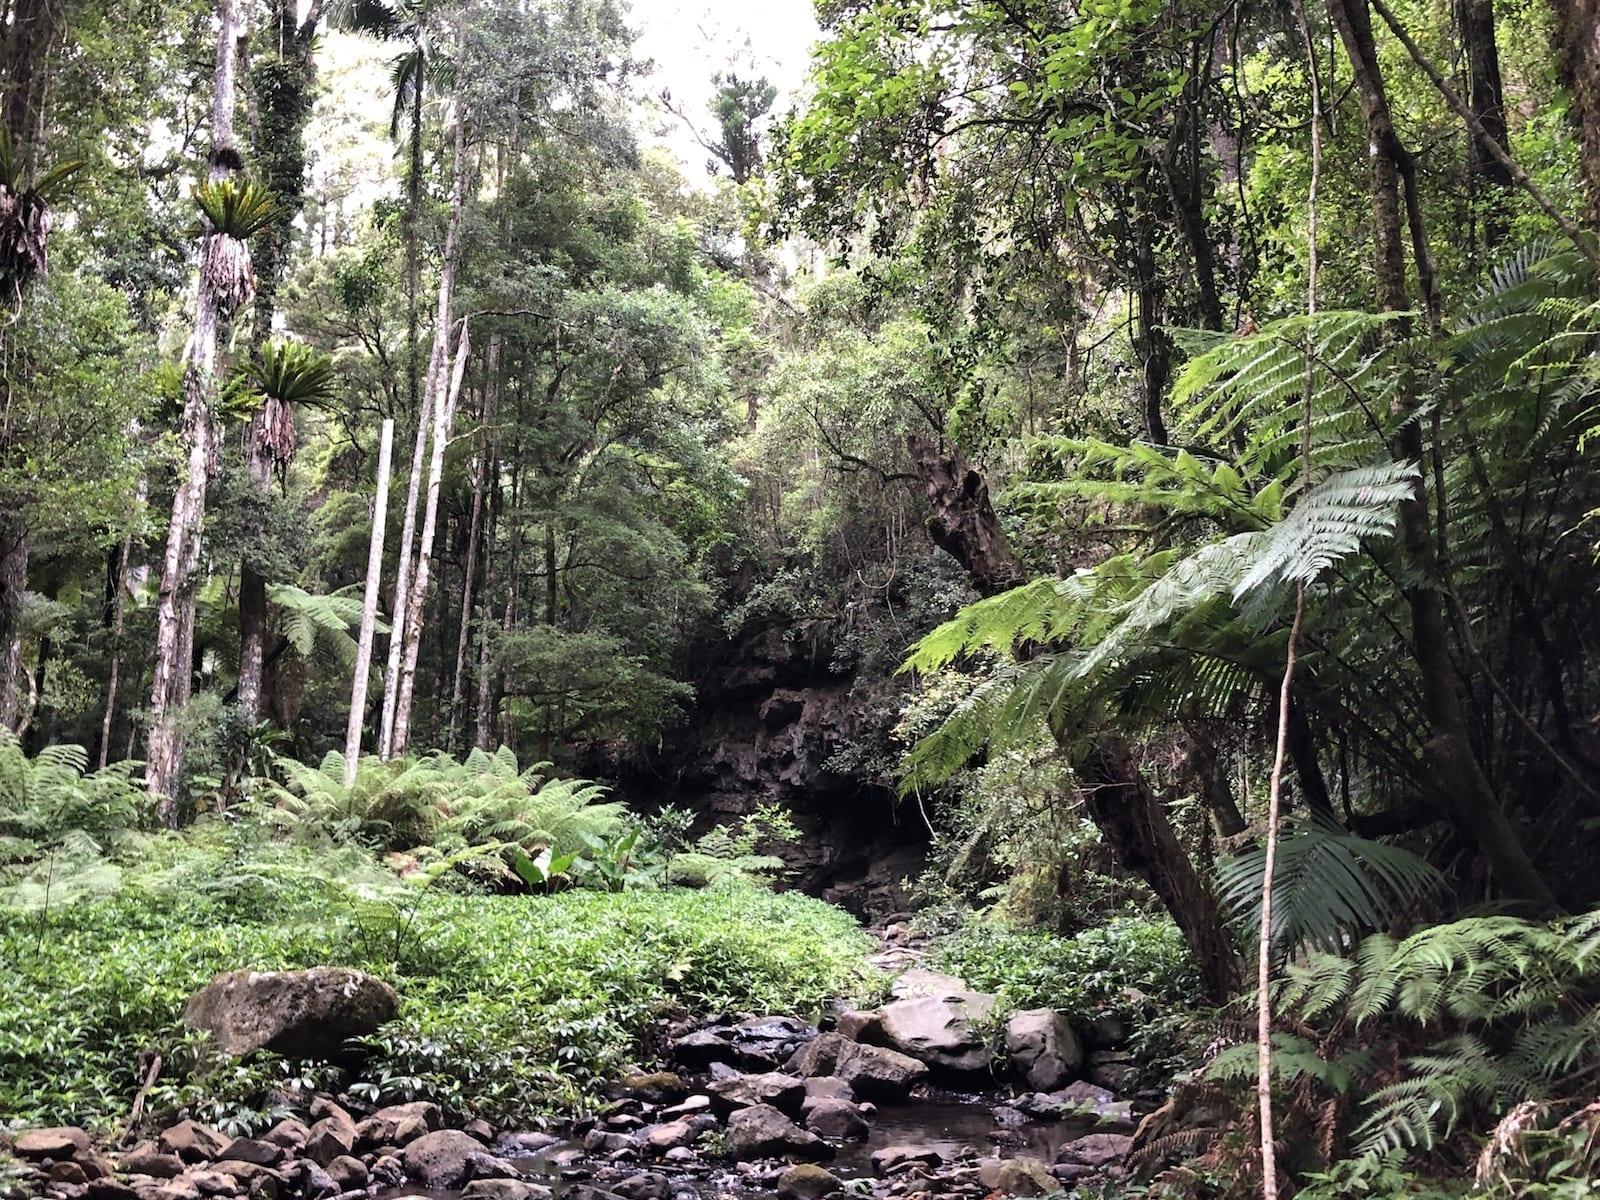 Dalrymple Creek cuts through the rainforest on the Cascades rainforest walk.